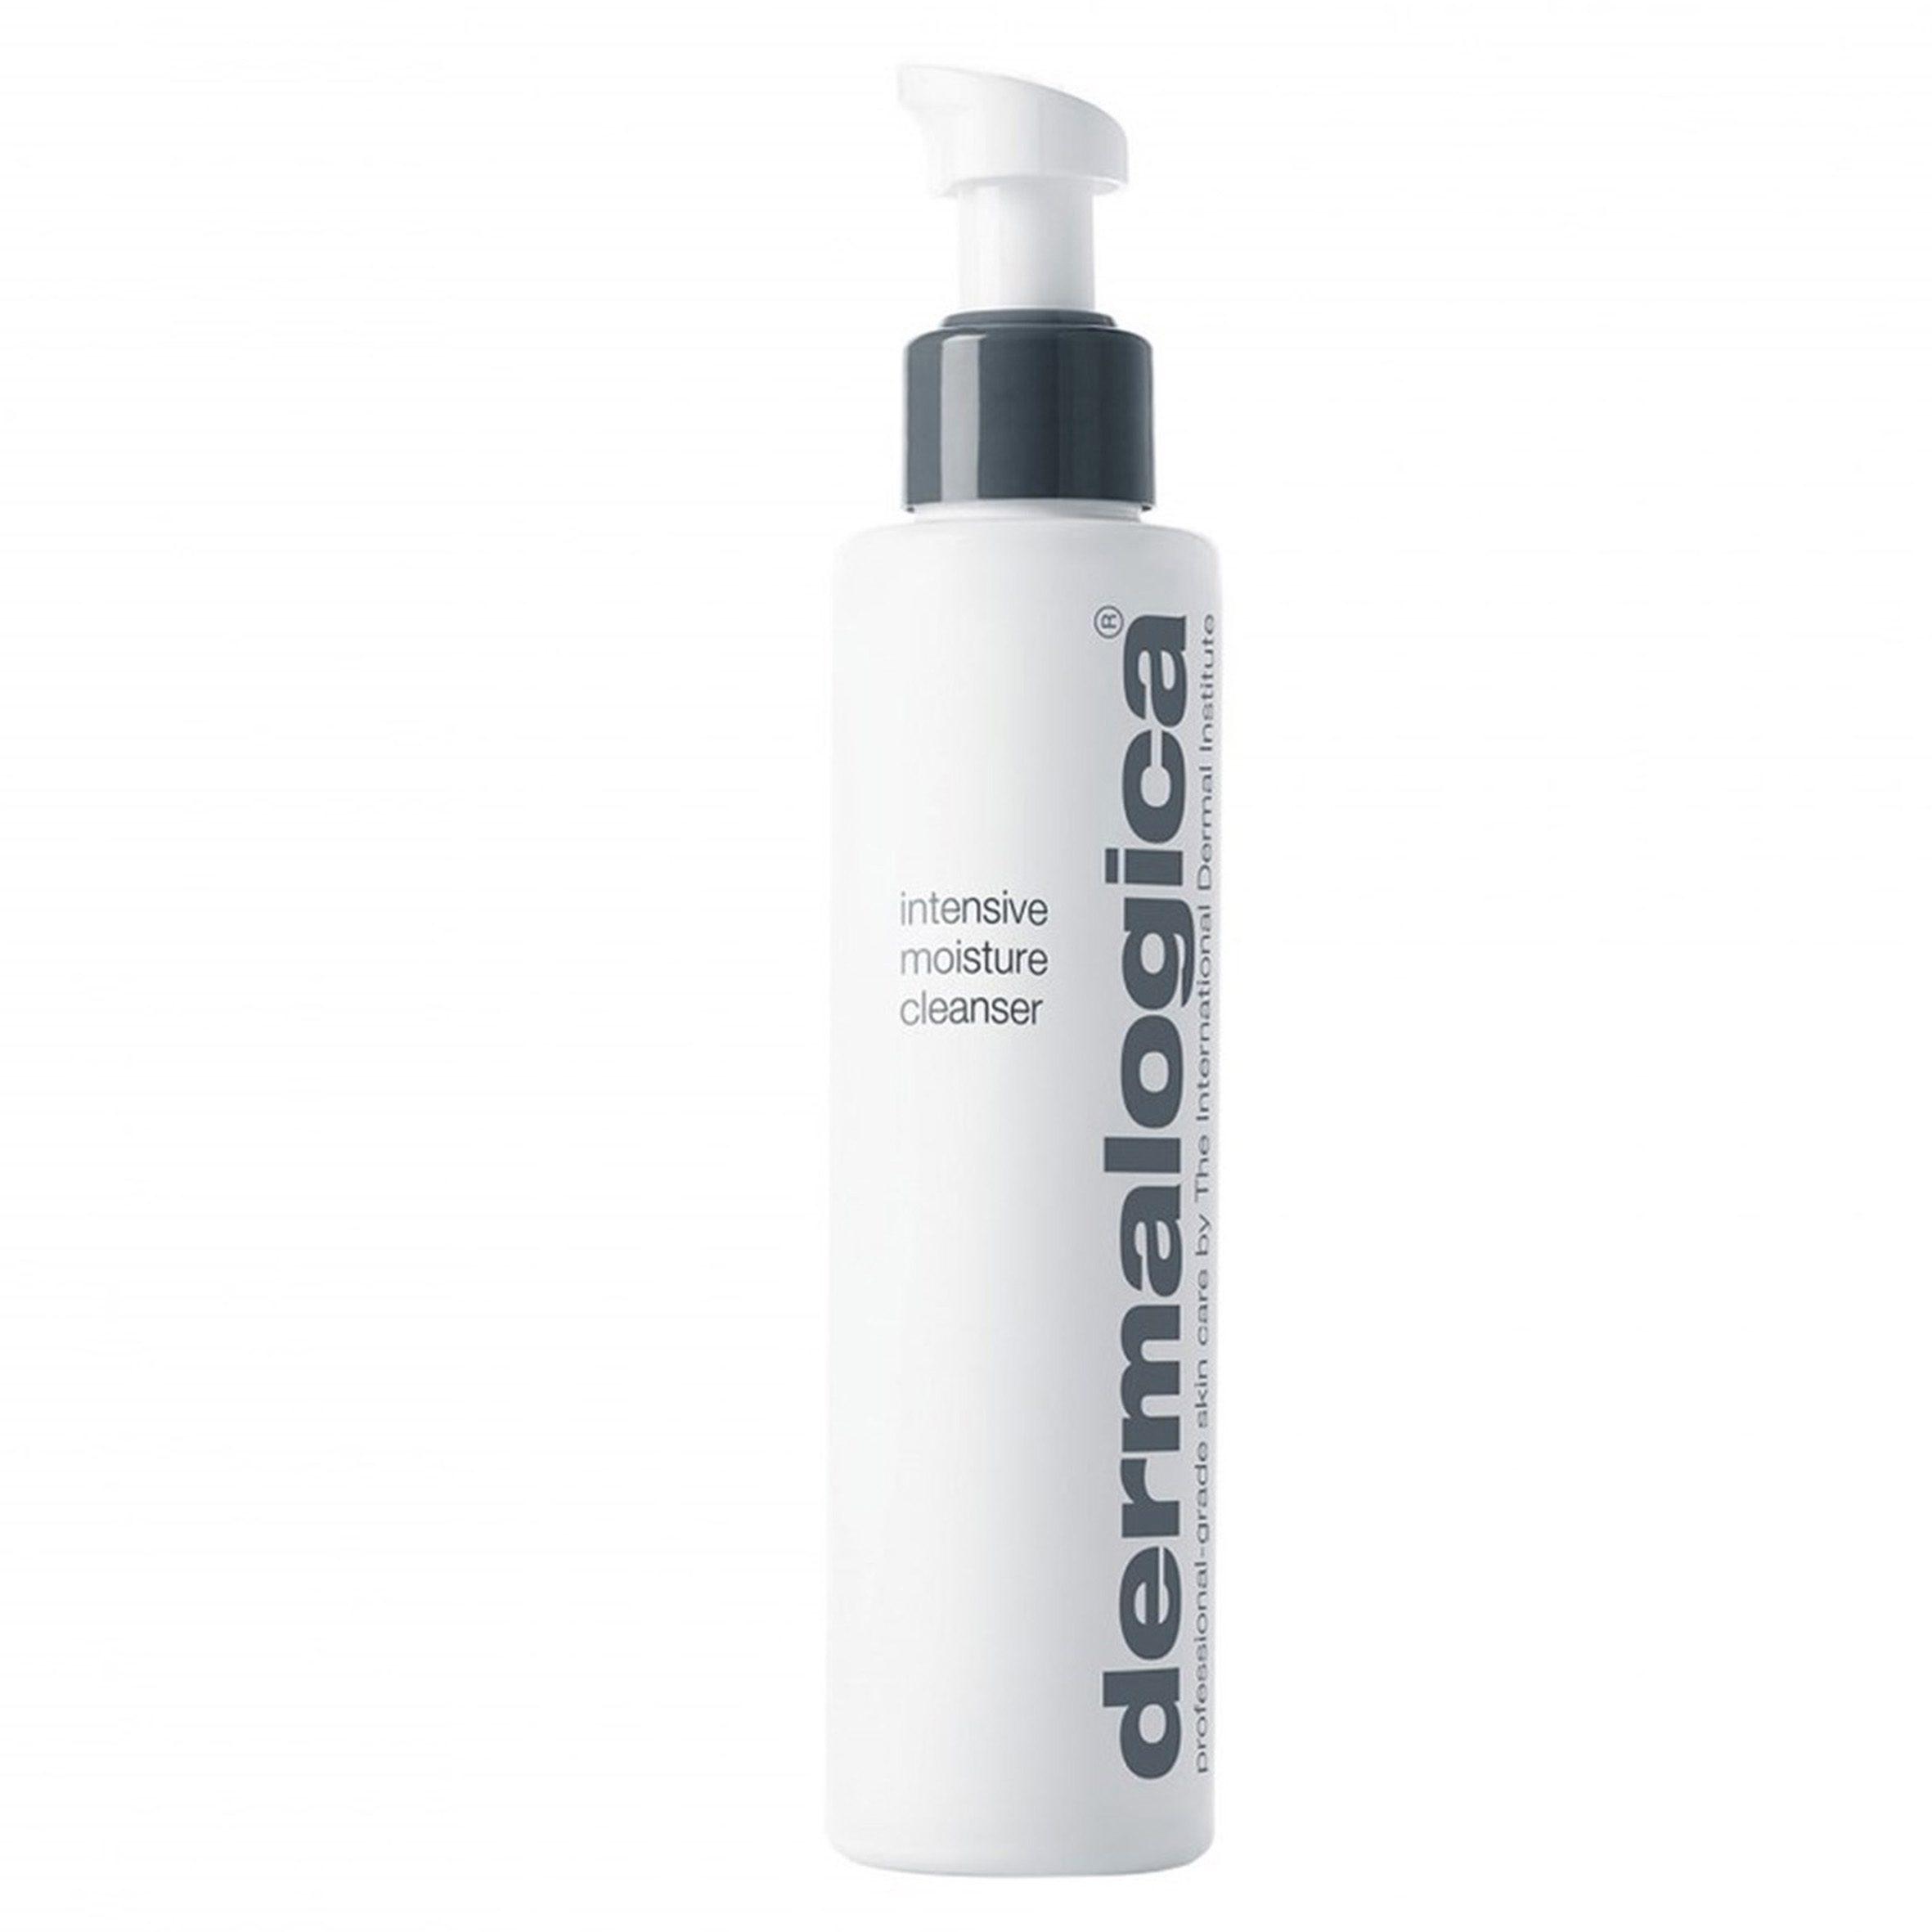 Intensive moisture cleanser 250ml